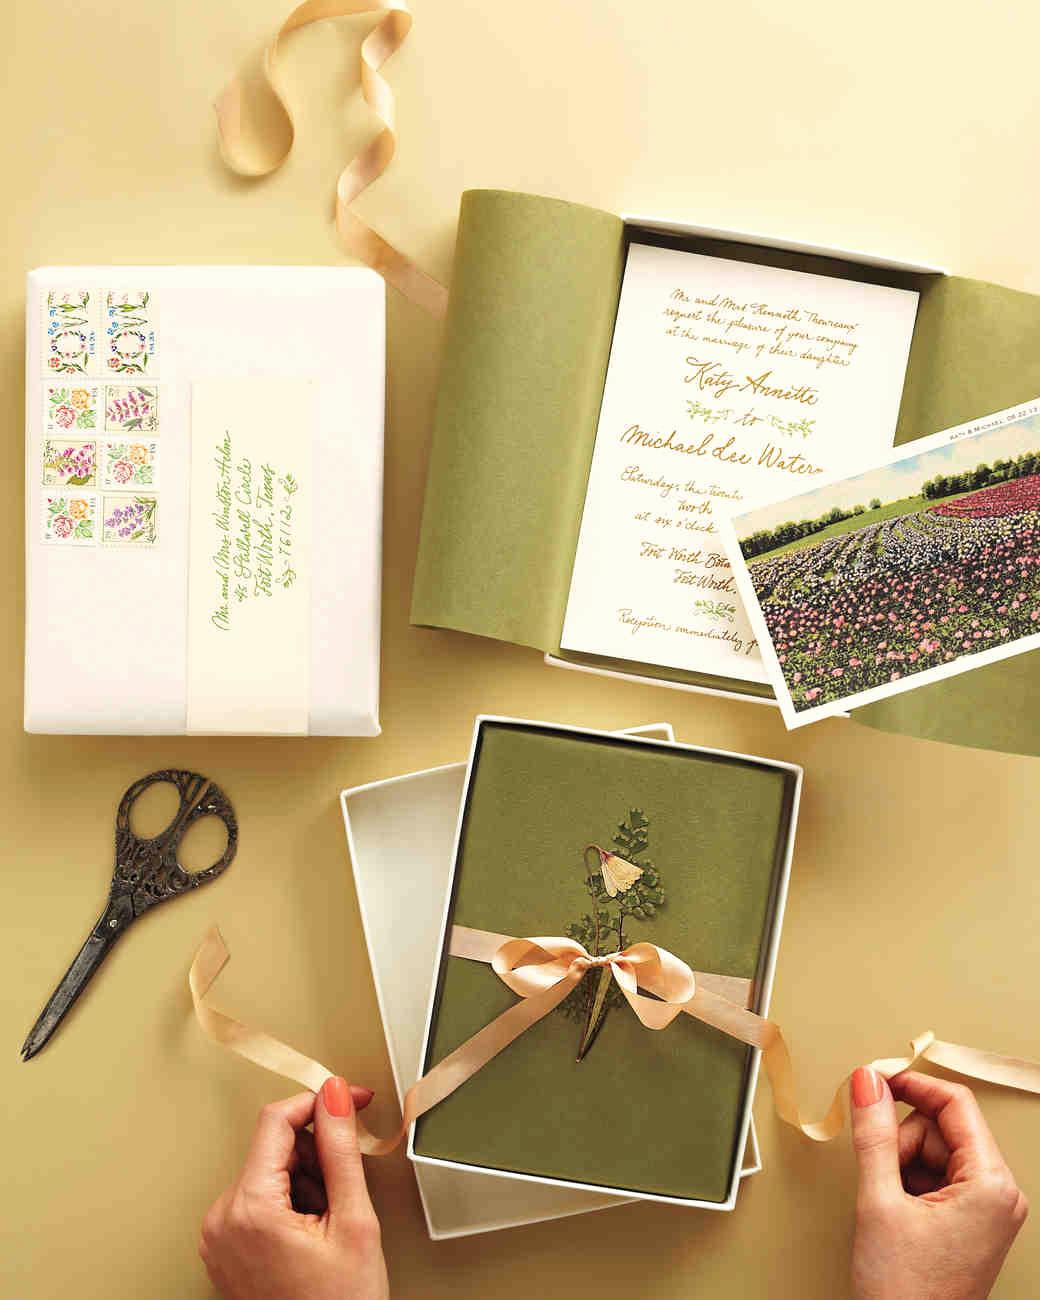 Wedding Invitation Details Card Wording New 8 Details to Include when Wording Your Wedding Invitation